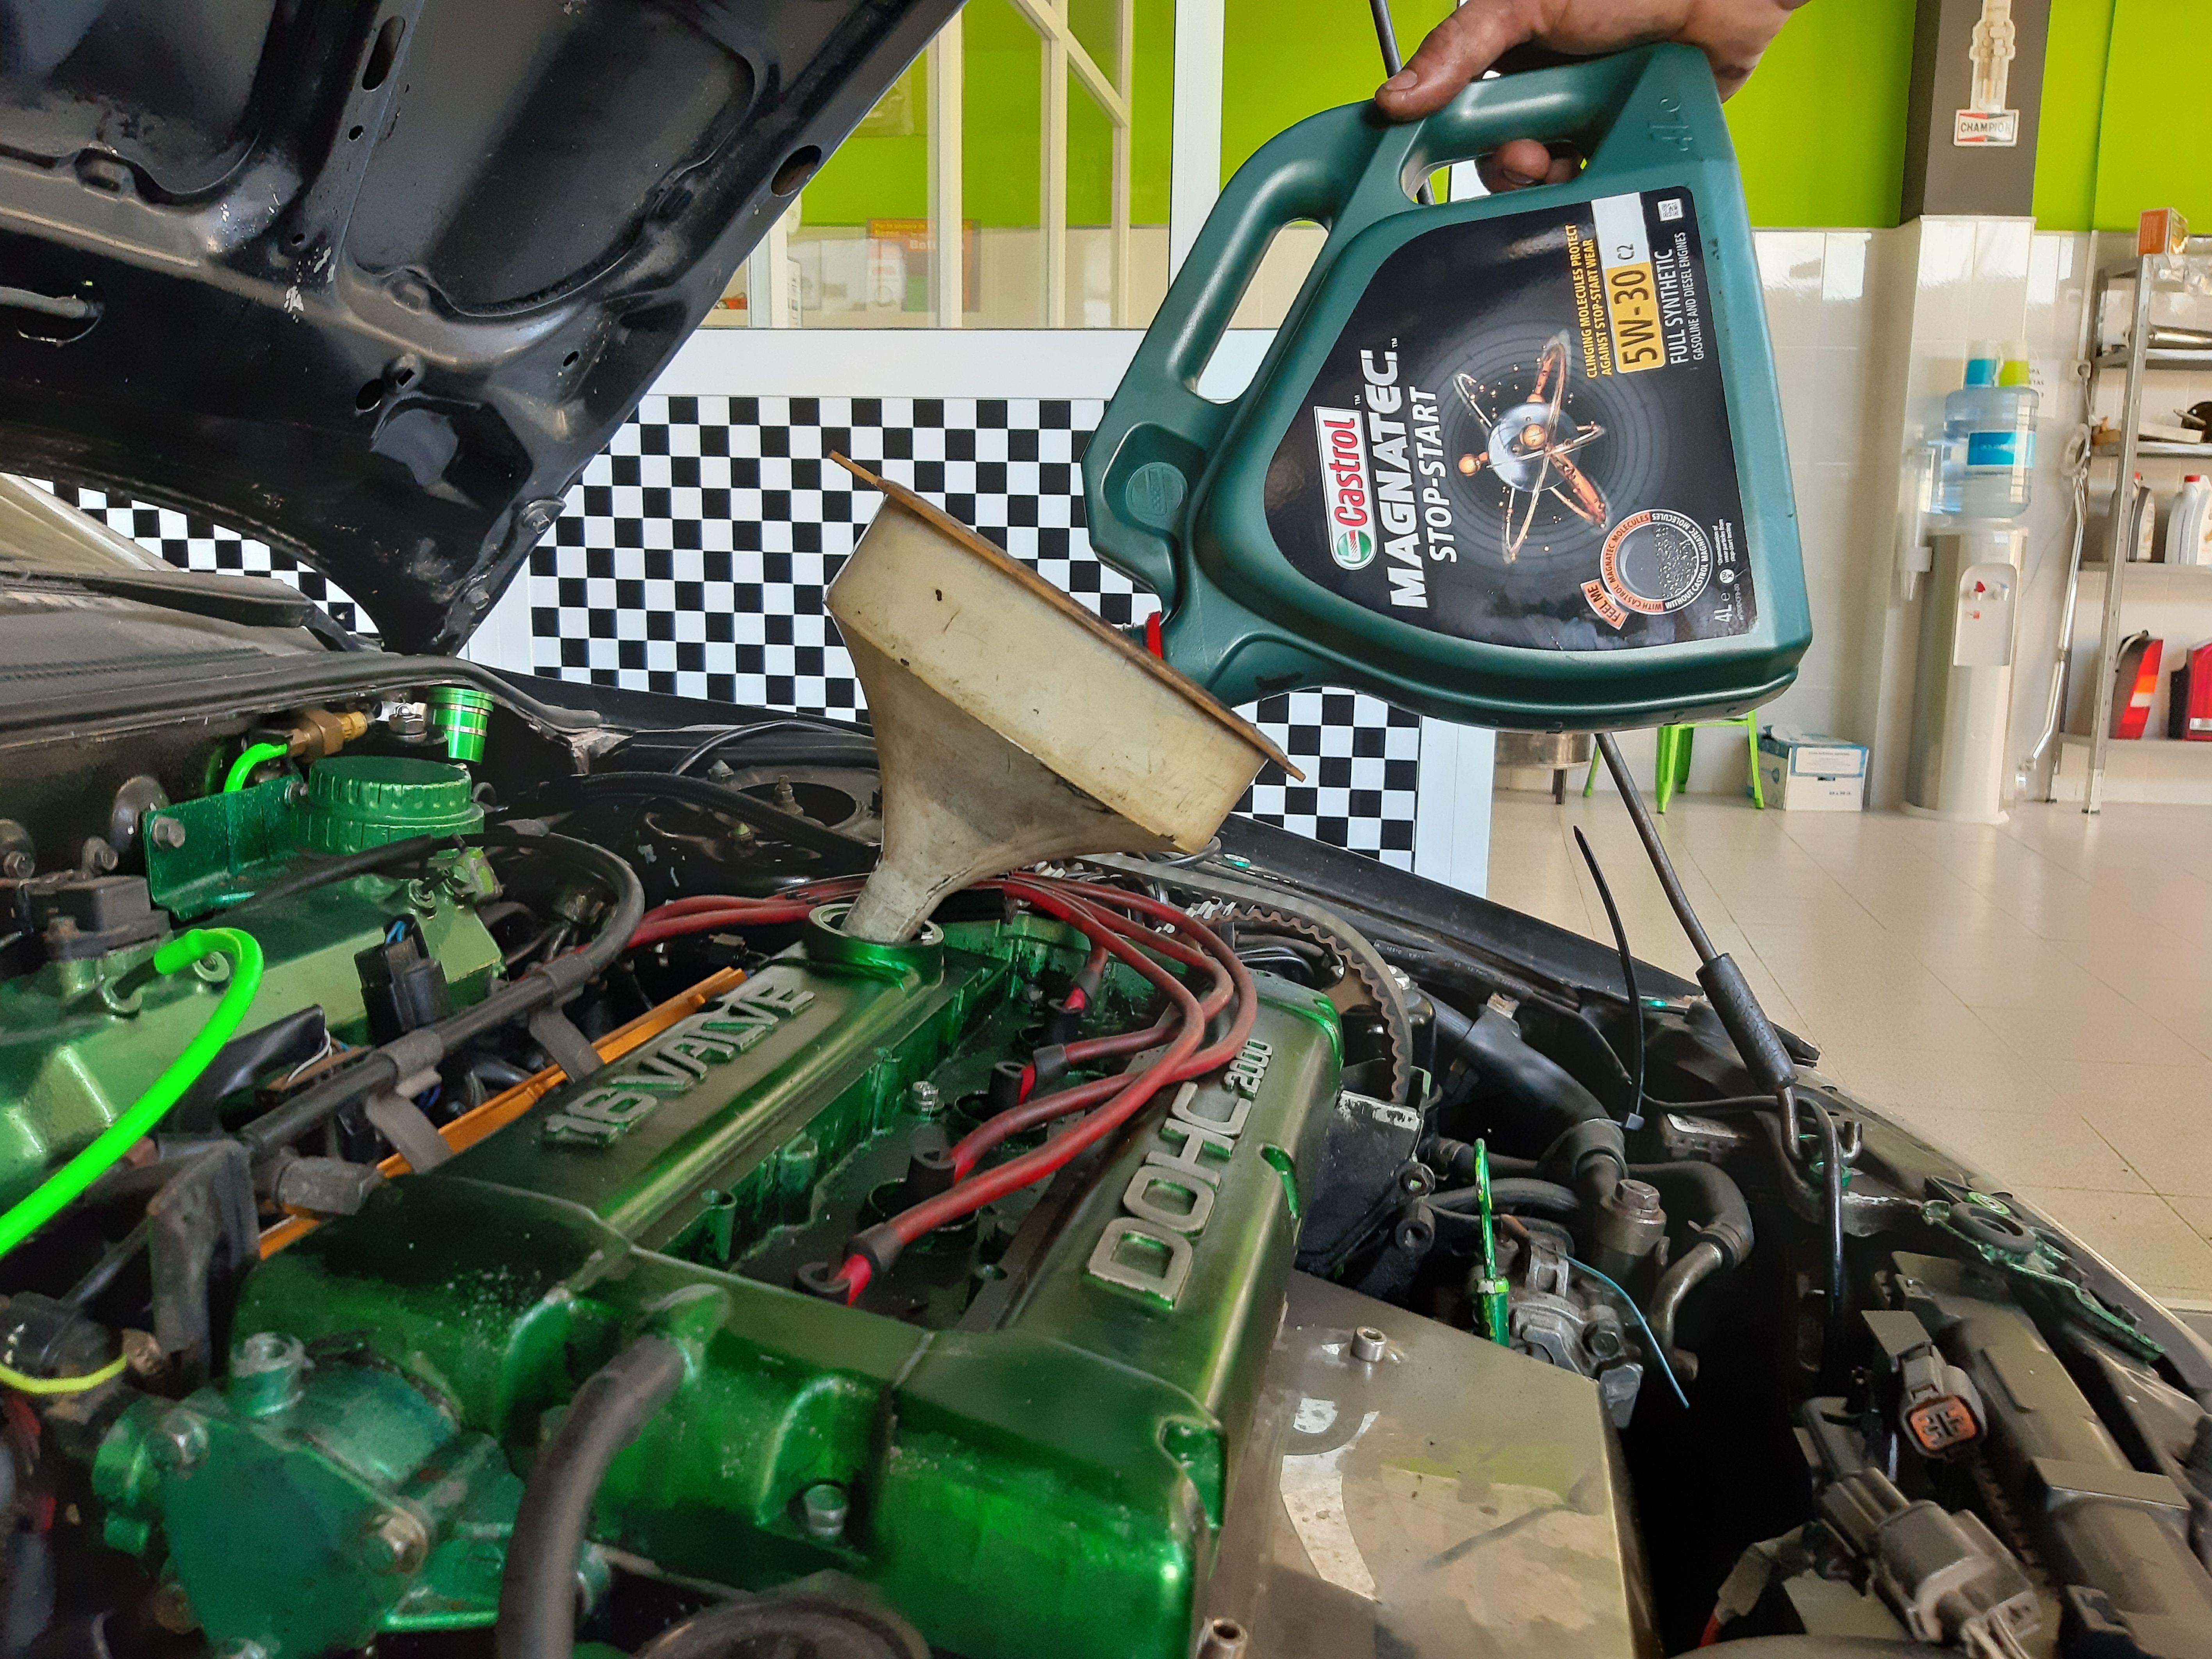 Car repair workshop in Pedreguer